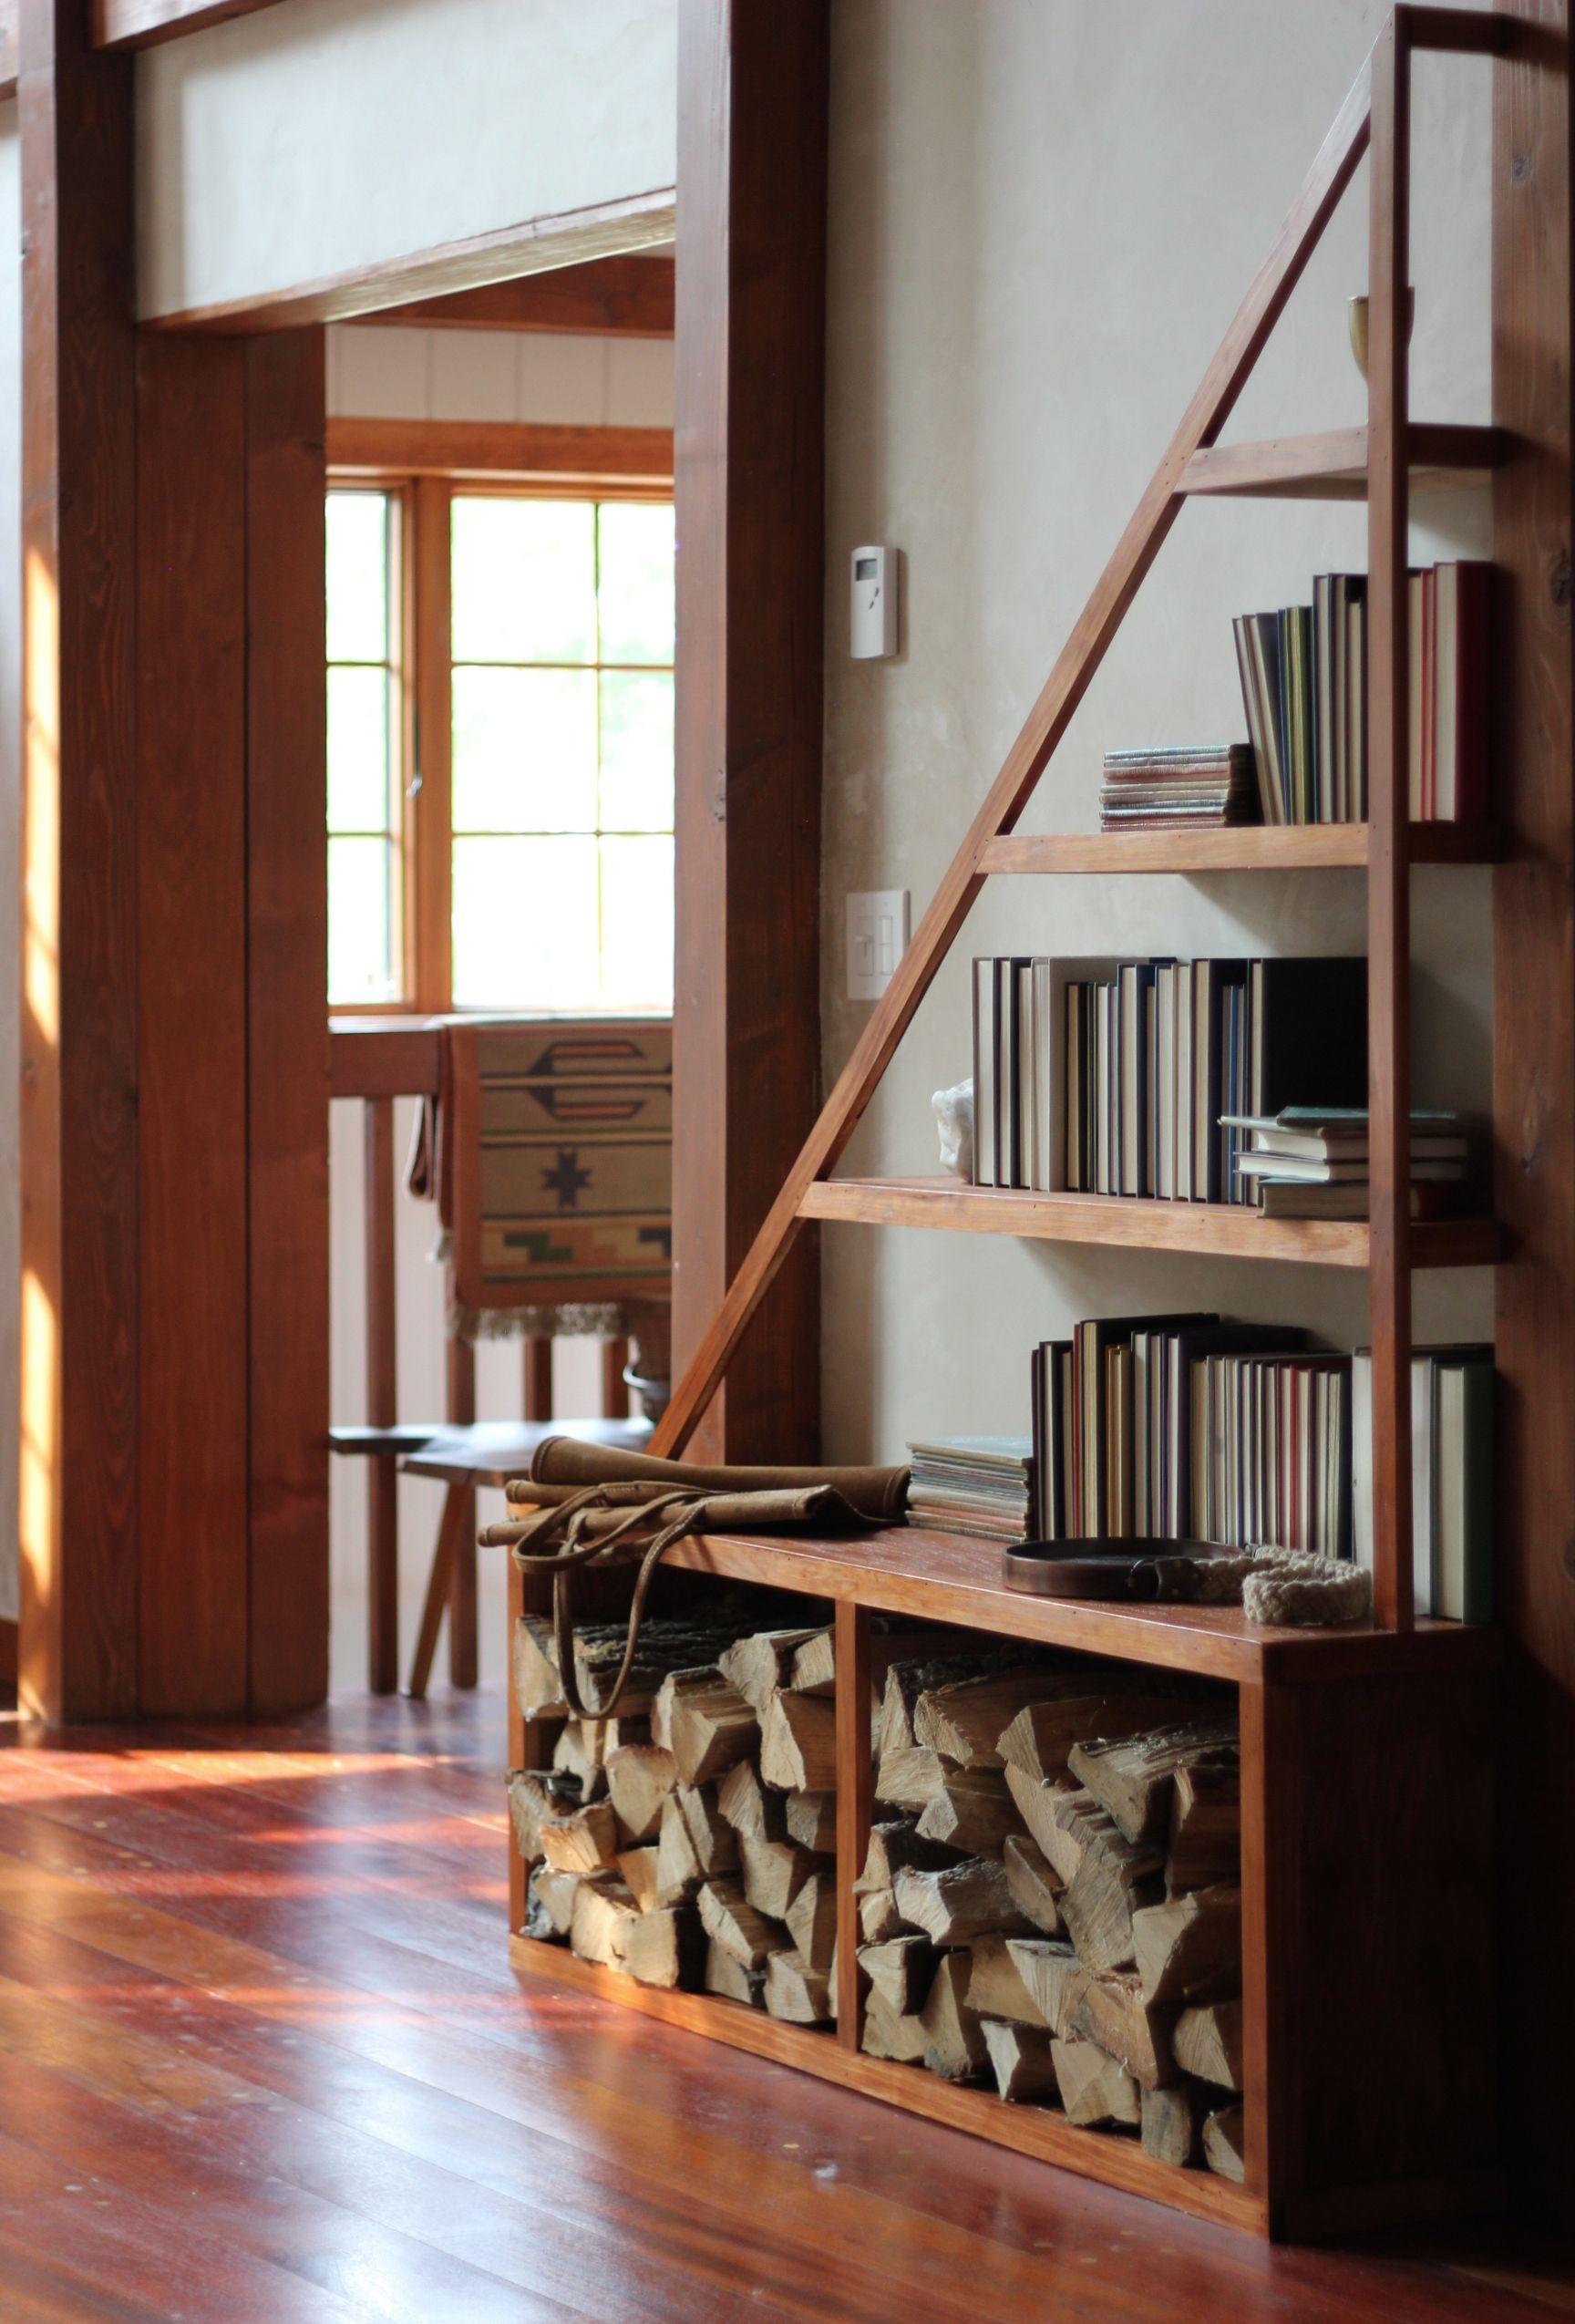 Captivating A Custom Triangular Bookshelf Sits Atop Built In Fireplace Wood Storage.  Photo By Heidiu0027s